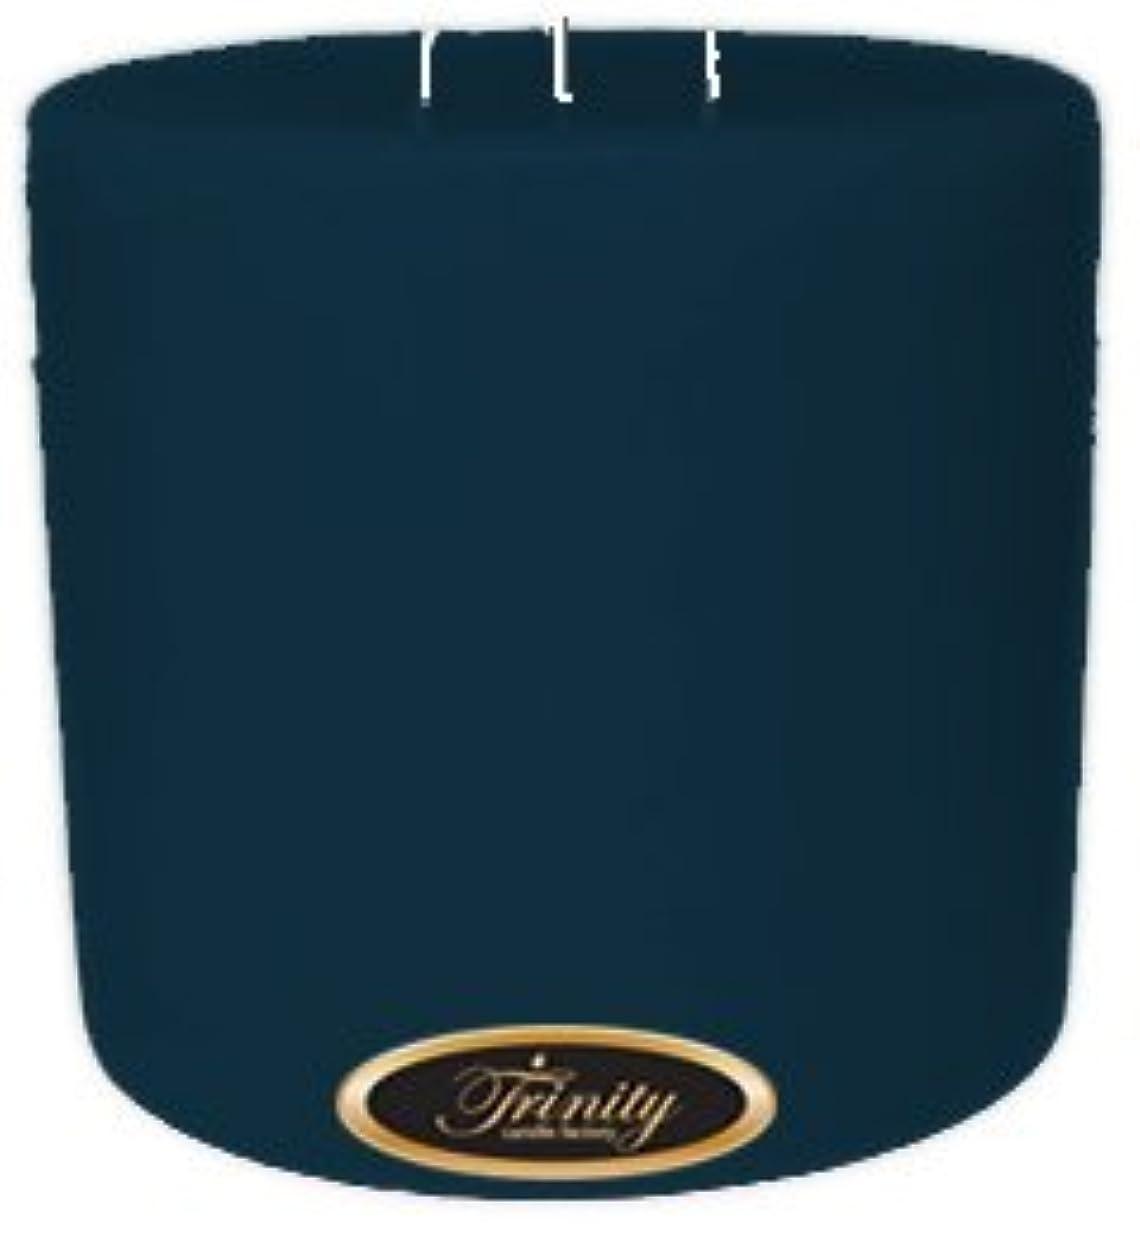 Trinity Candle工場 – Summer Nights – Pillar Candle – 6 x 6